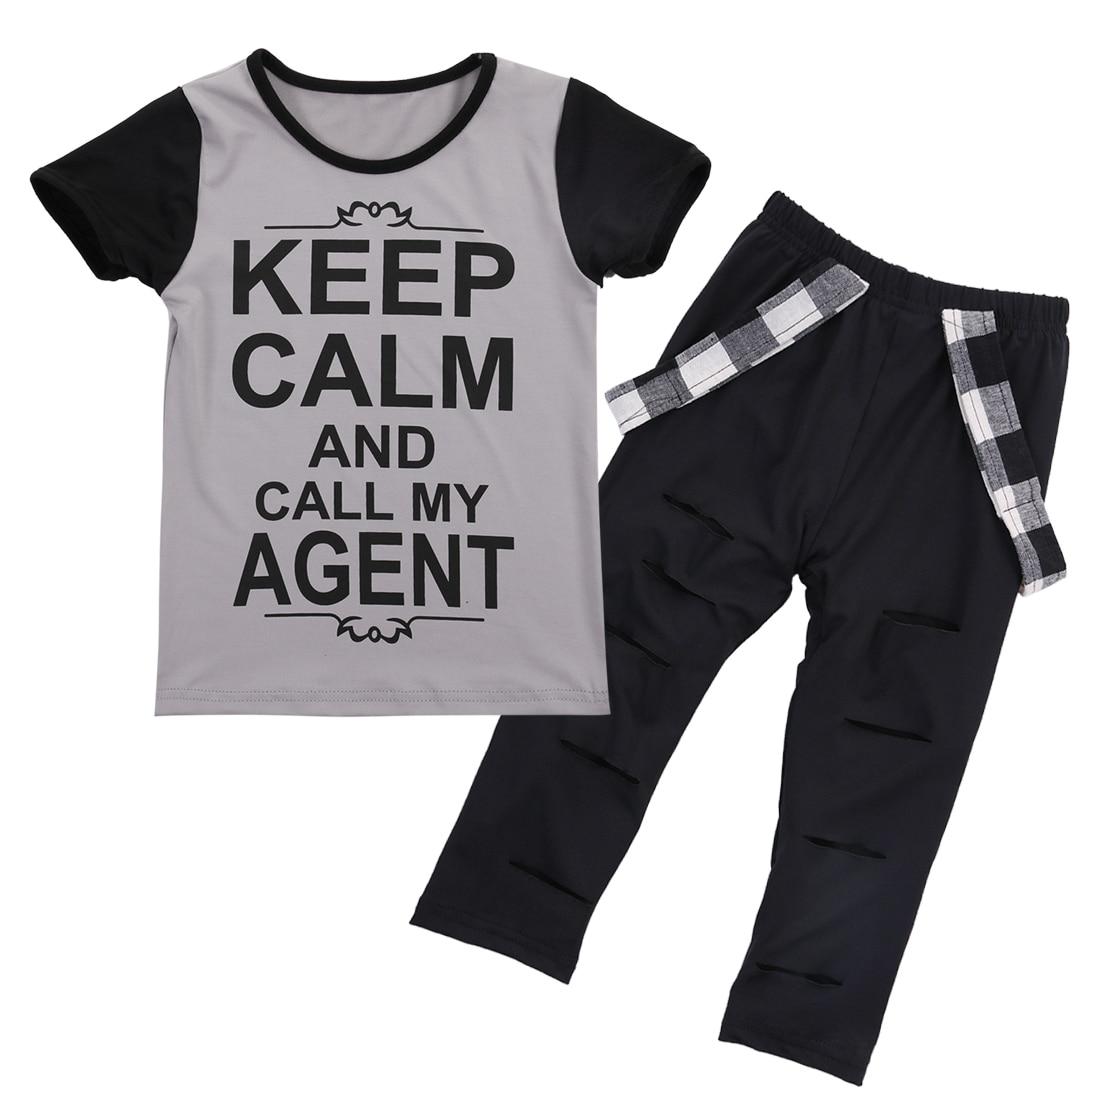 2016 Newborn Infant Kids Baby Girls Keep Calm T-shirt +Pants Outfits Clothes Set Summer Toddler Chidren Clothing